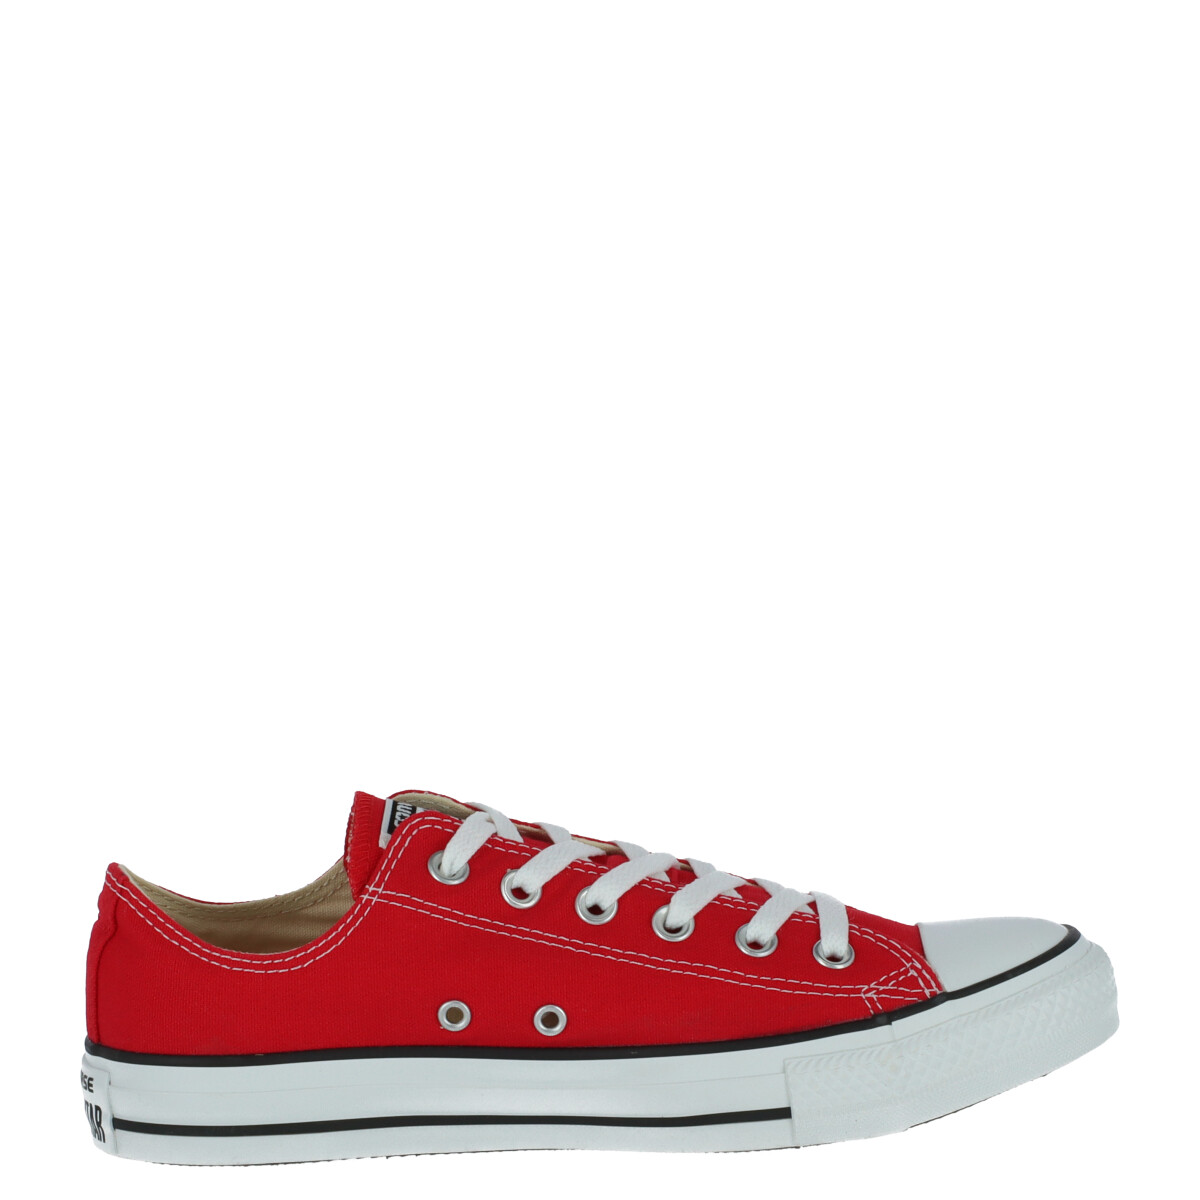 Converse All Star Sneakers Muži